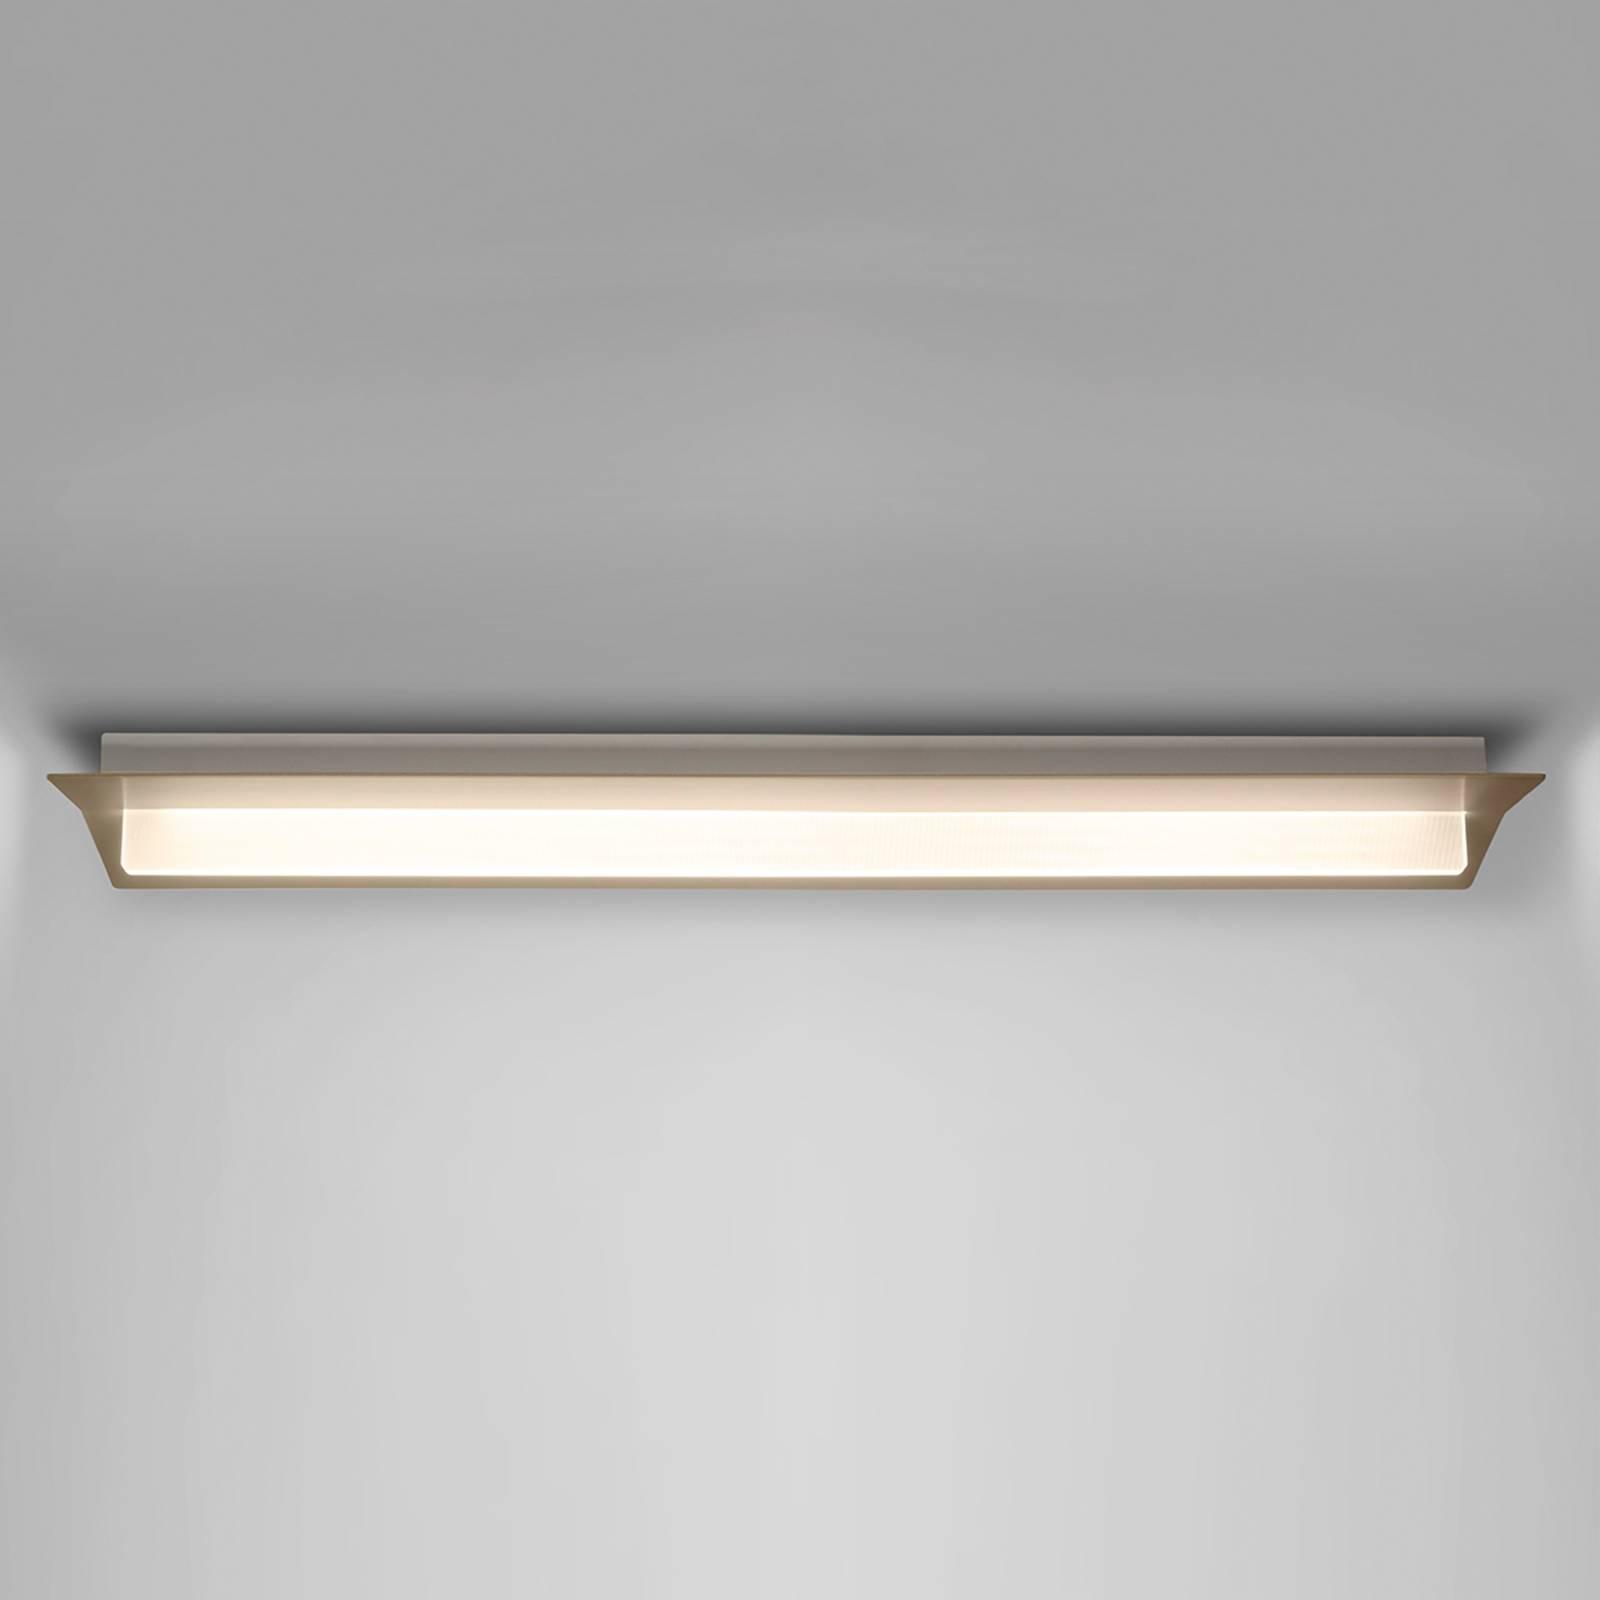 LED plafondlamp Flurry, 100 cm, brons